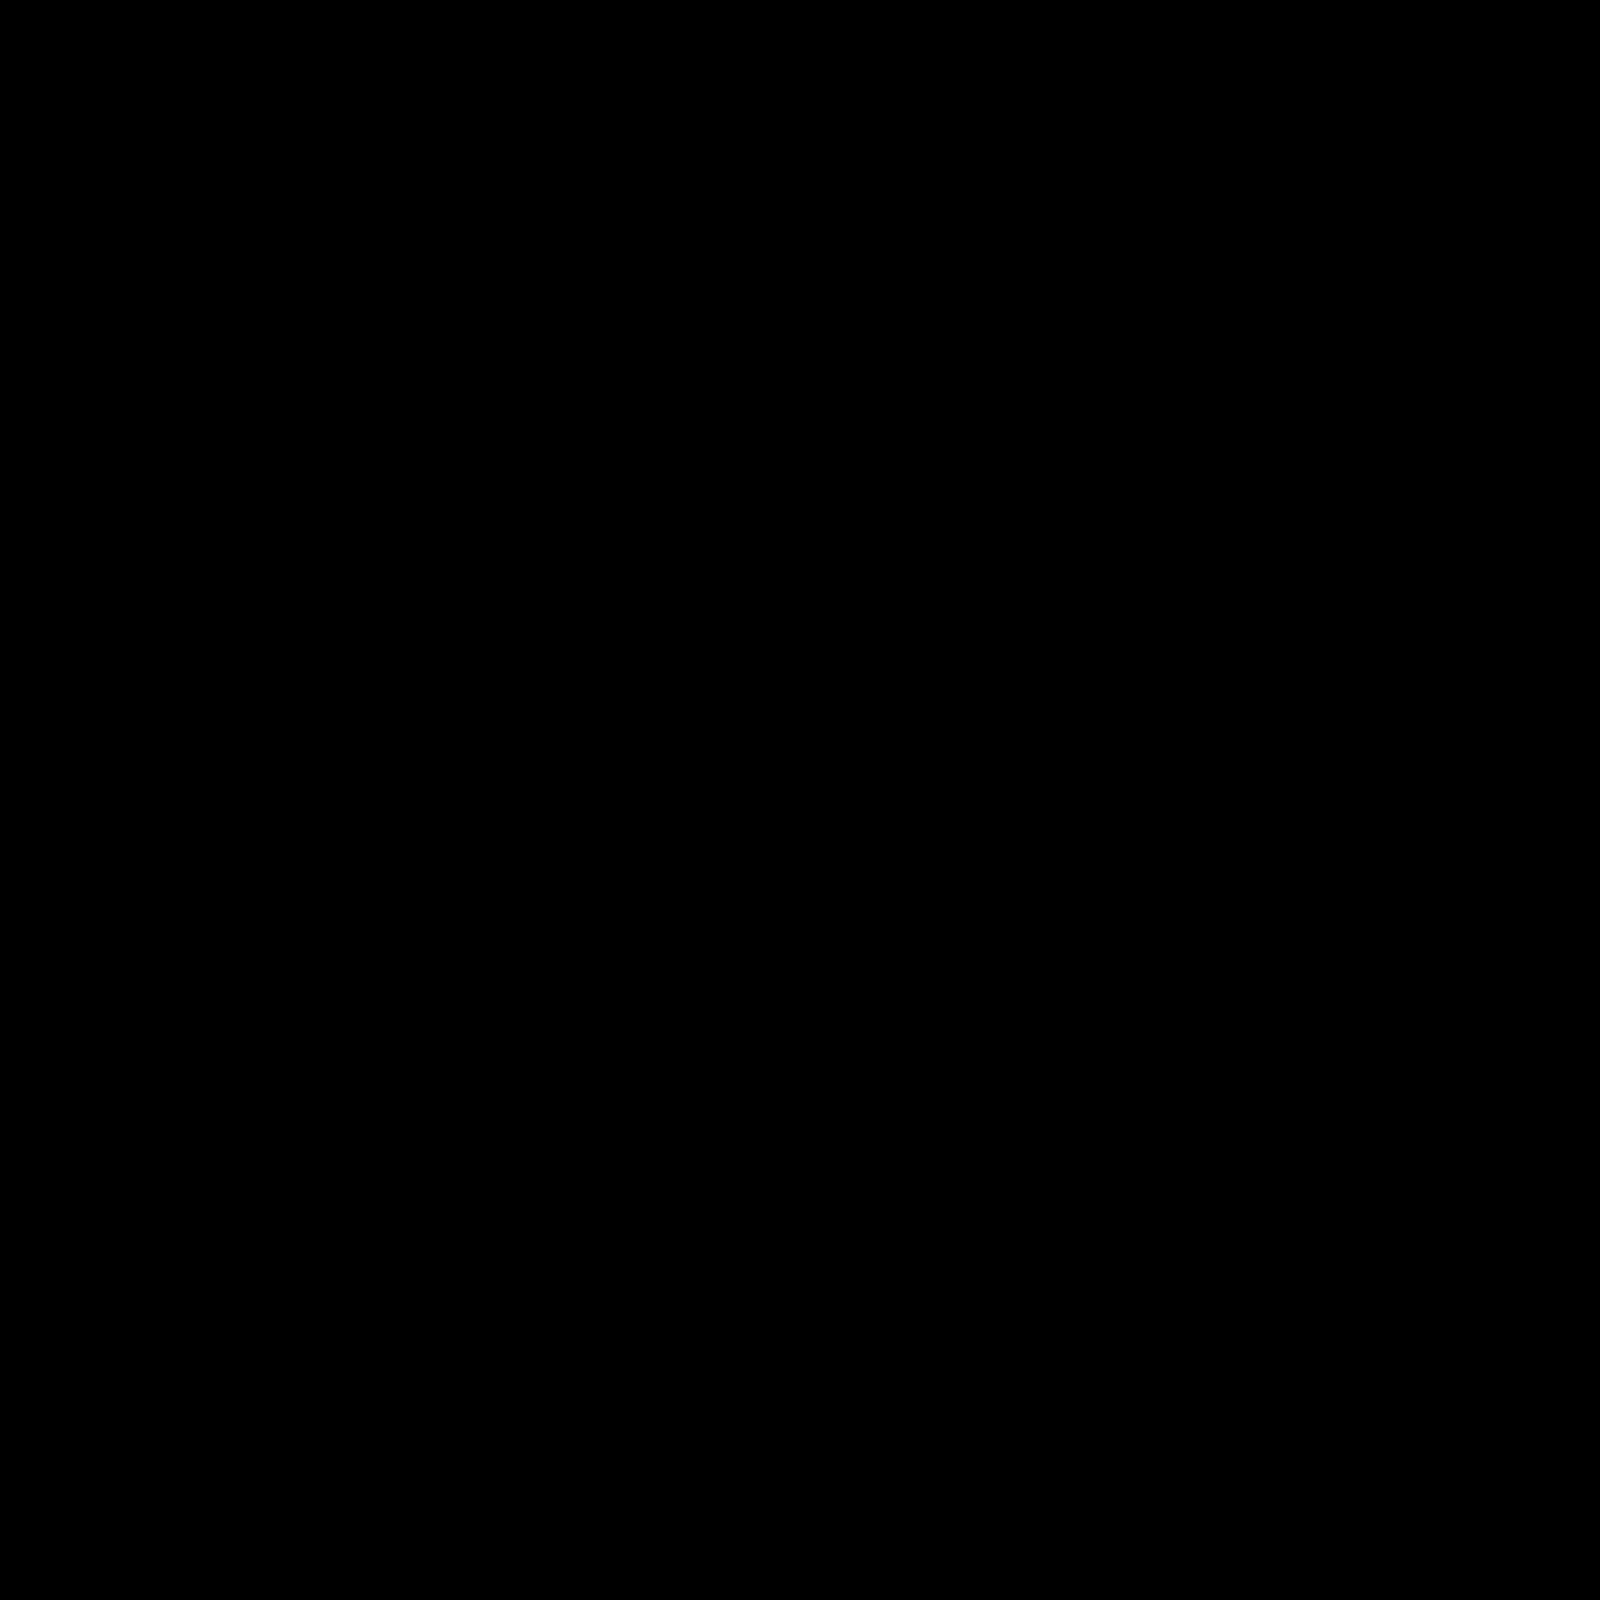 1600x1600 Submit Document Icon